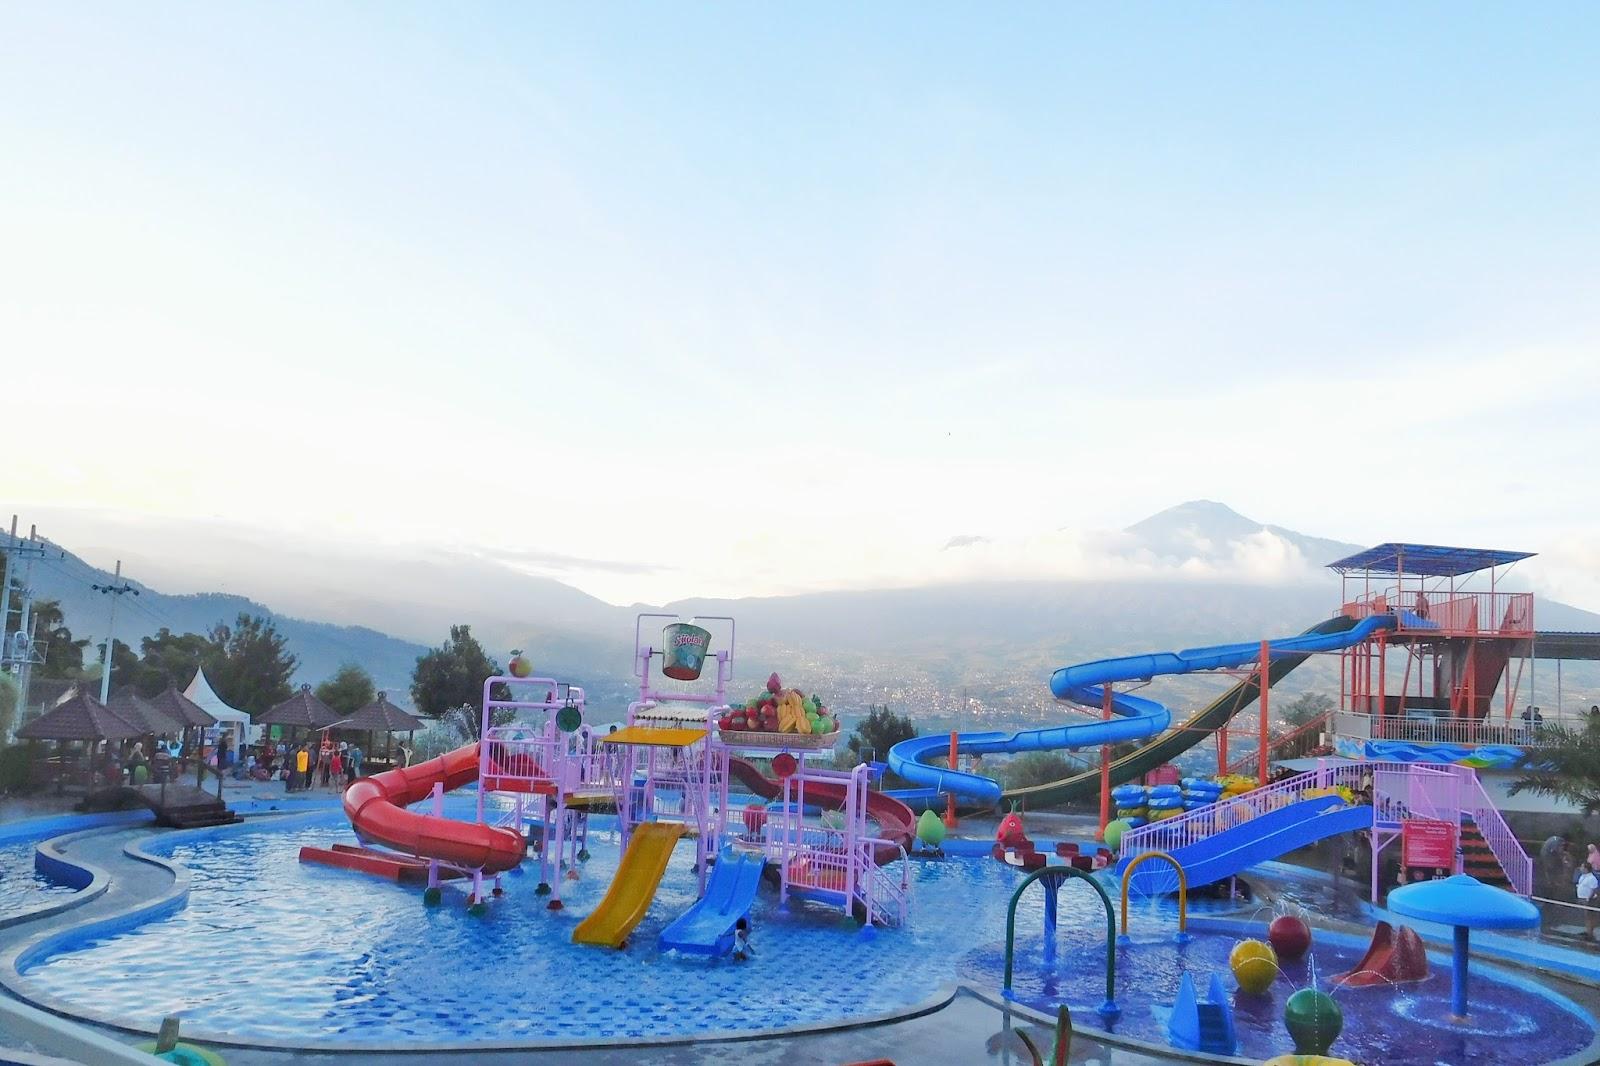 Kusuma Agrowisata Waterpark Kolam Renang Air Hangat Batu Wonderland Kota